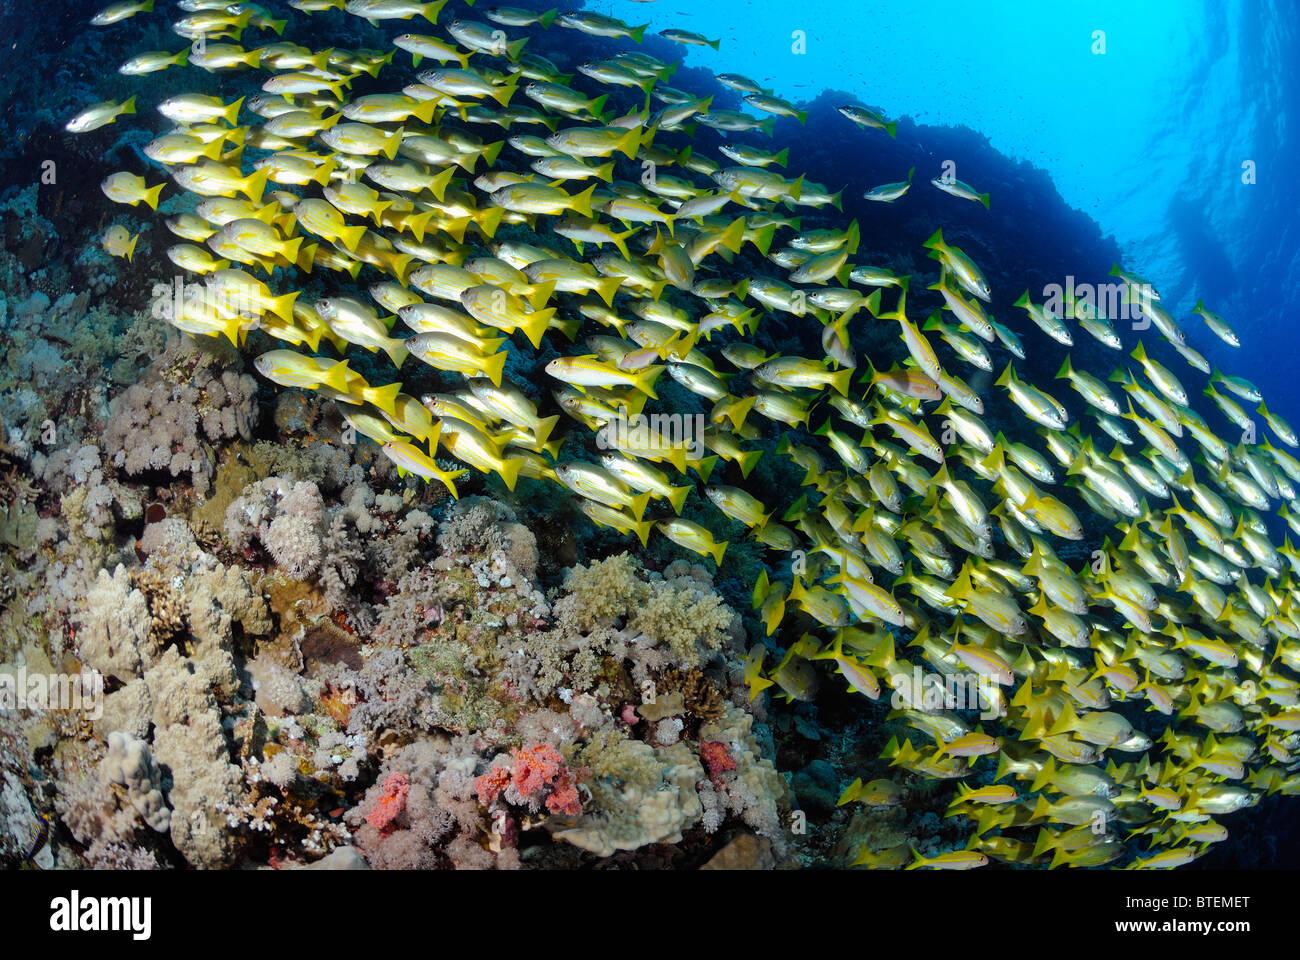 School of blackspot snapper fish, Big Brother Island, Egypt, Red Sea Stock Photo